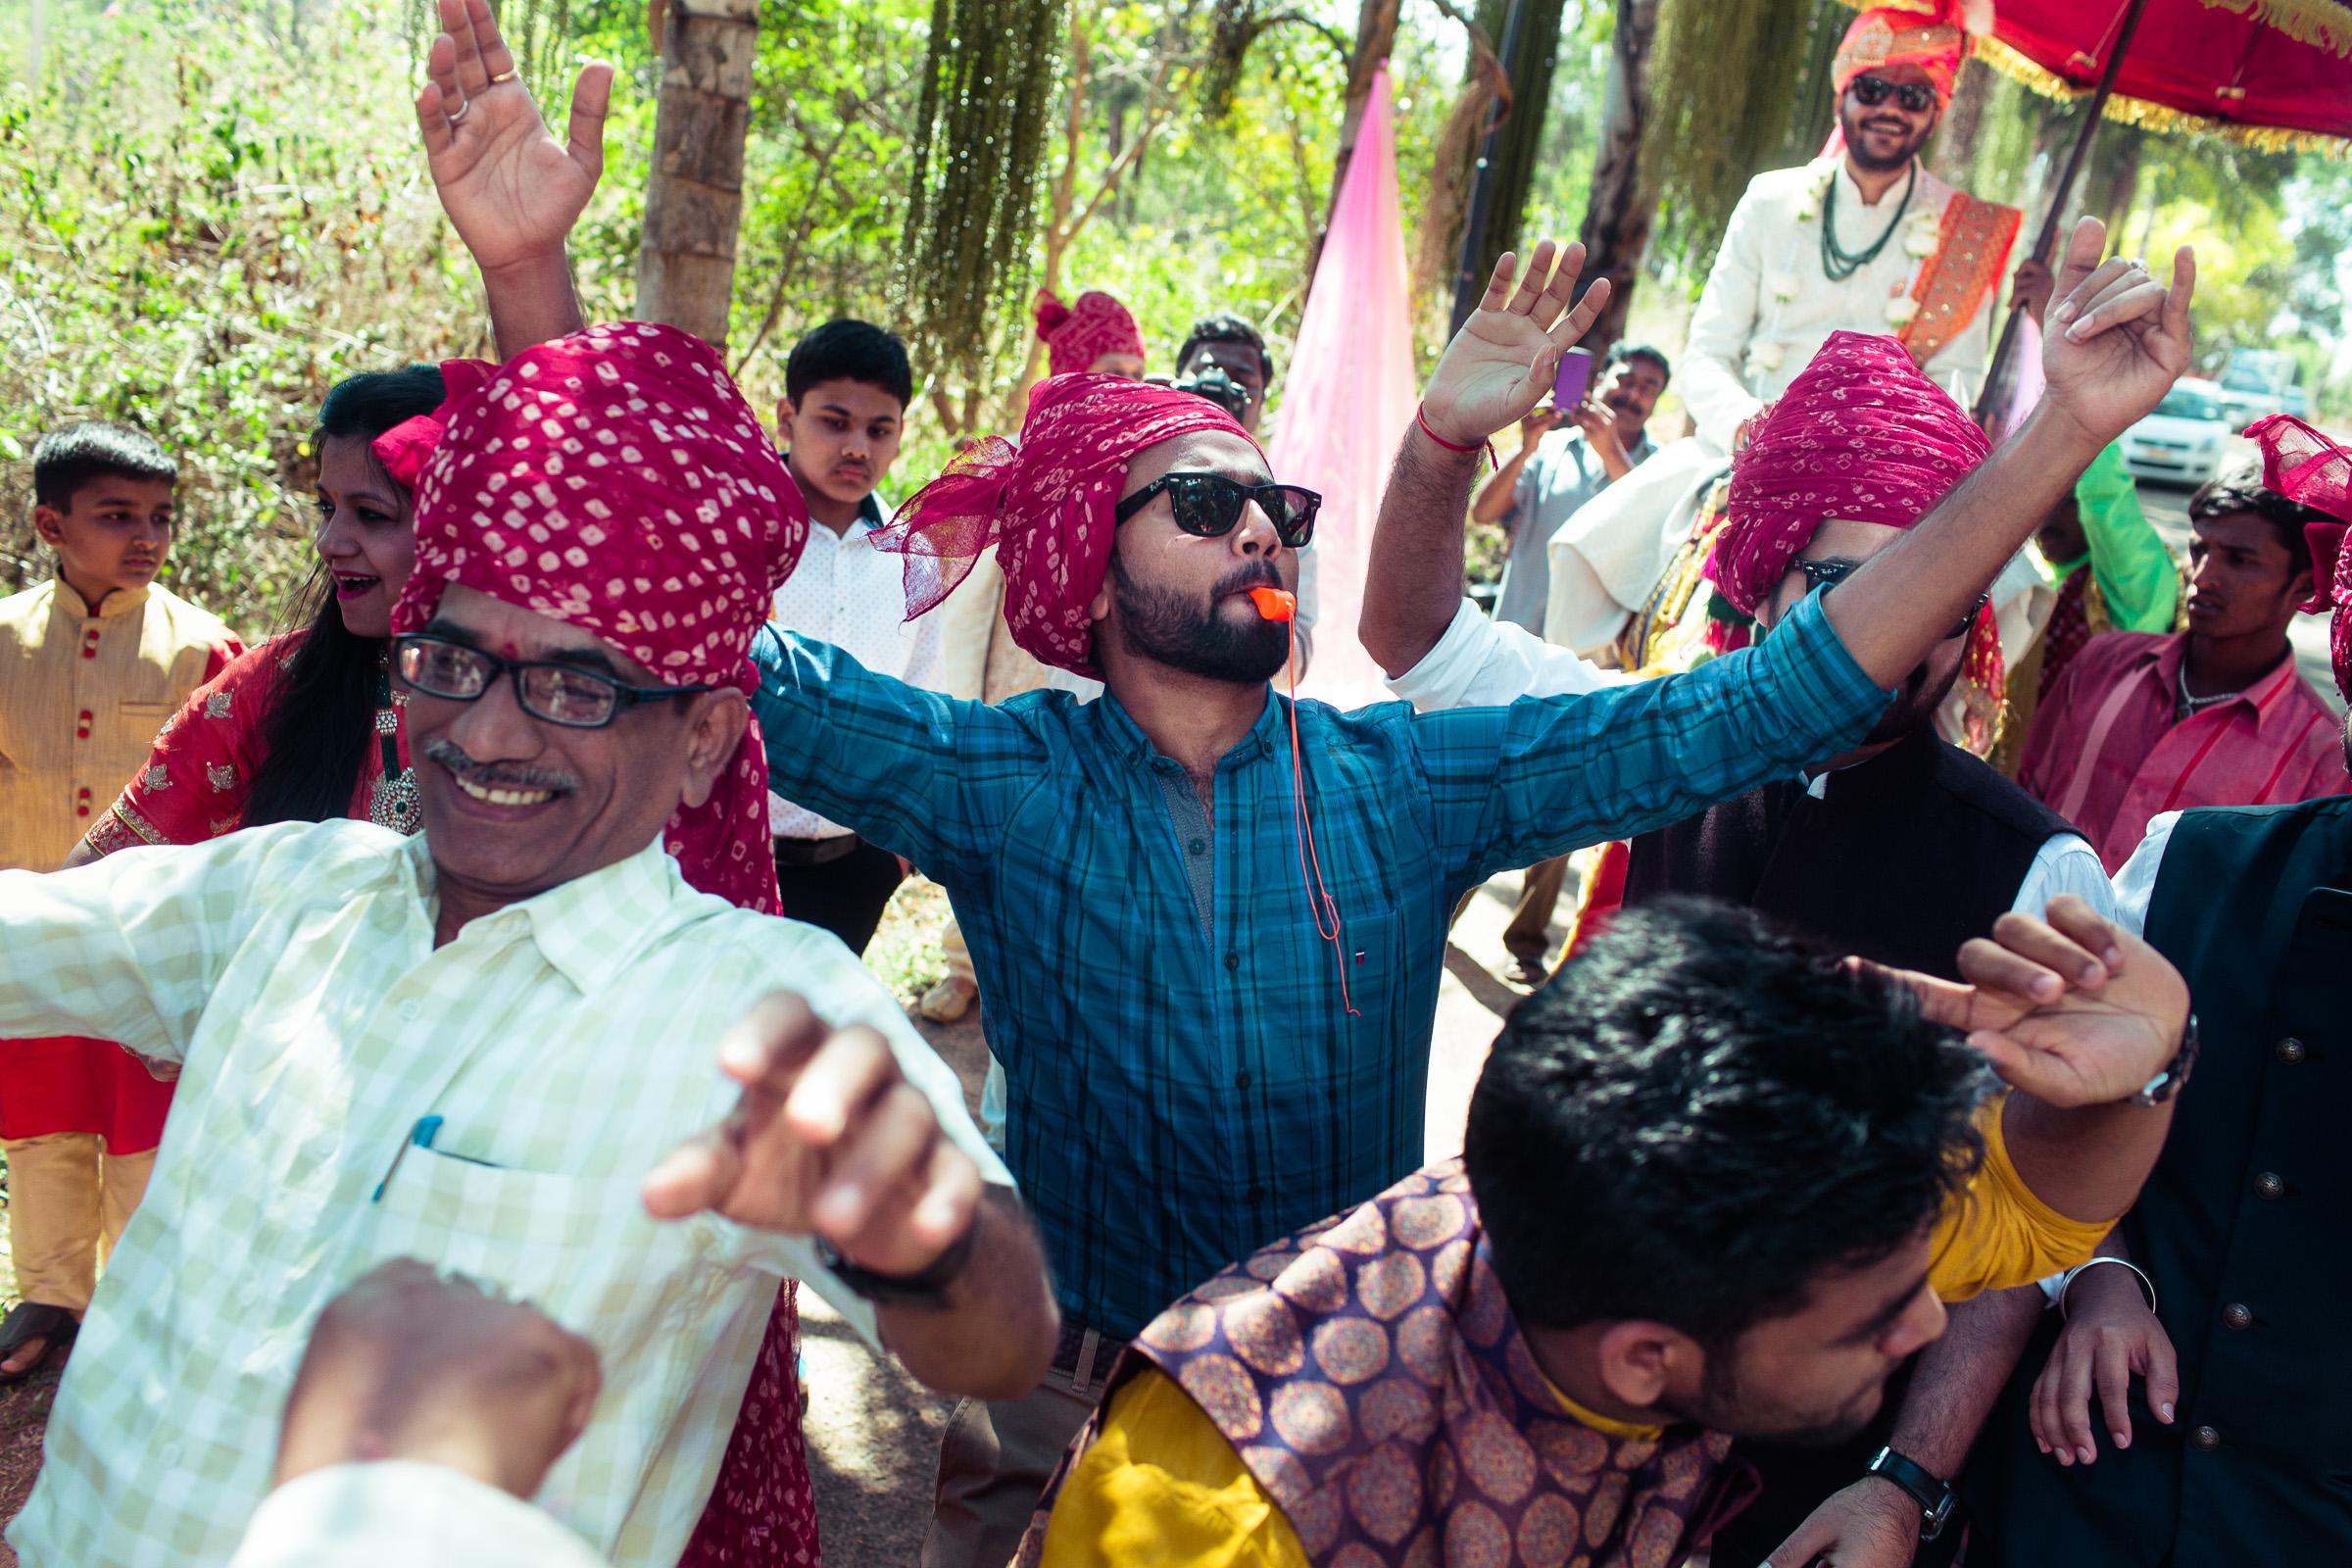 marwari-candid-wedding-photographers-bangalore-0017.jpg